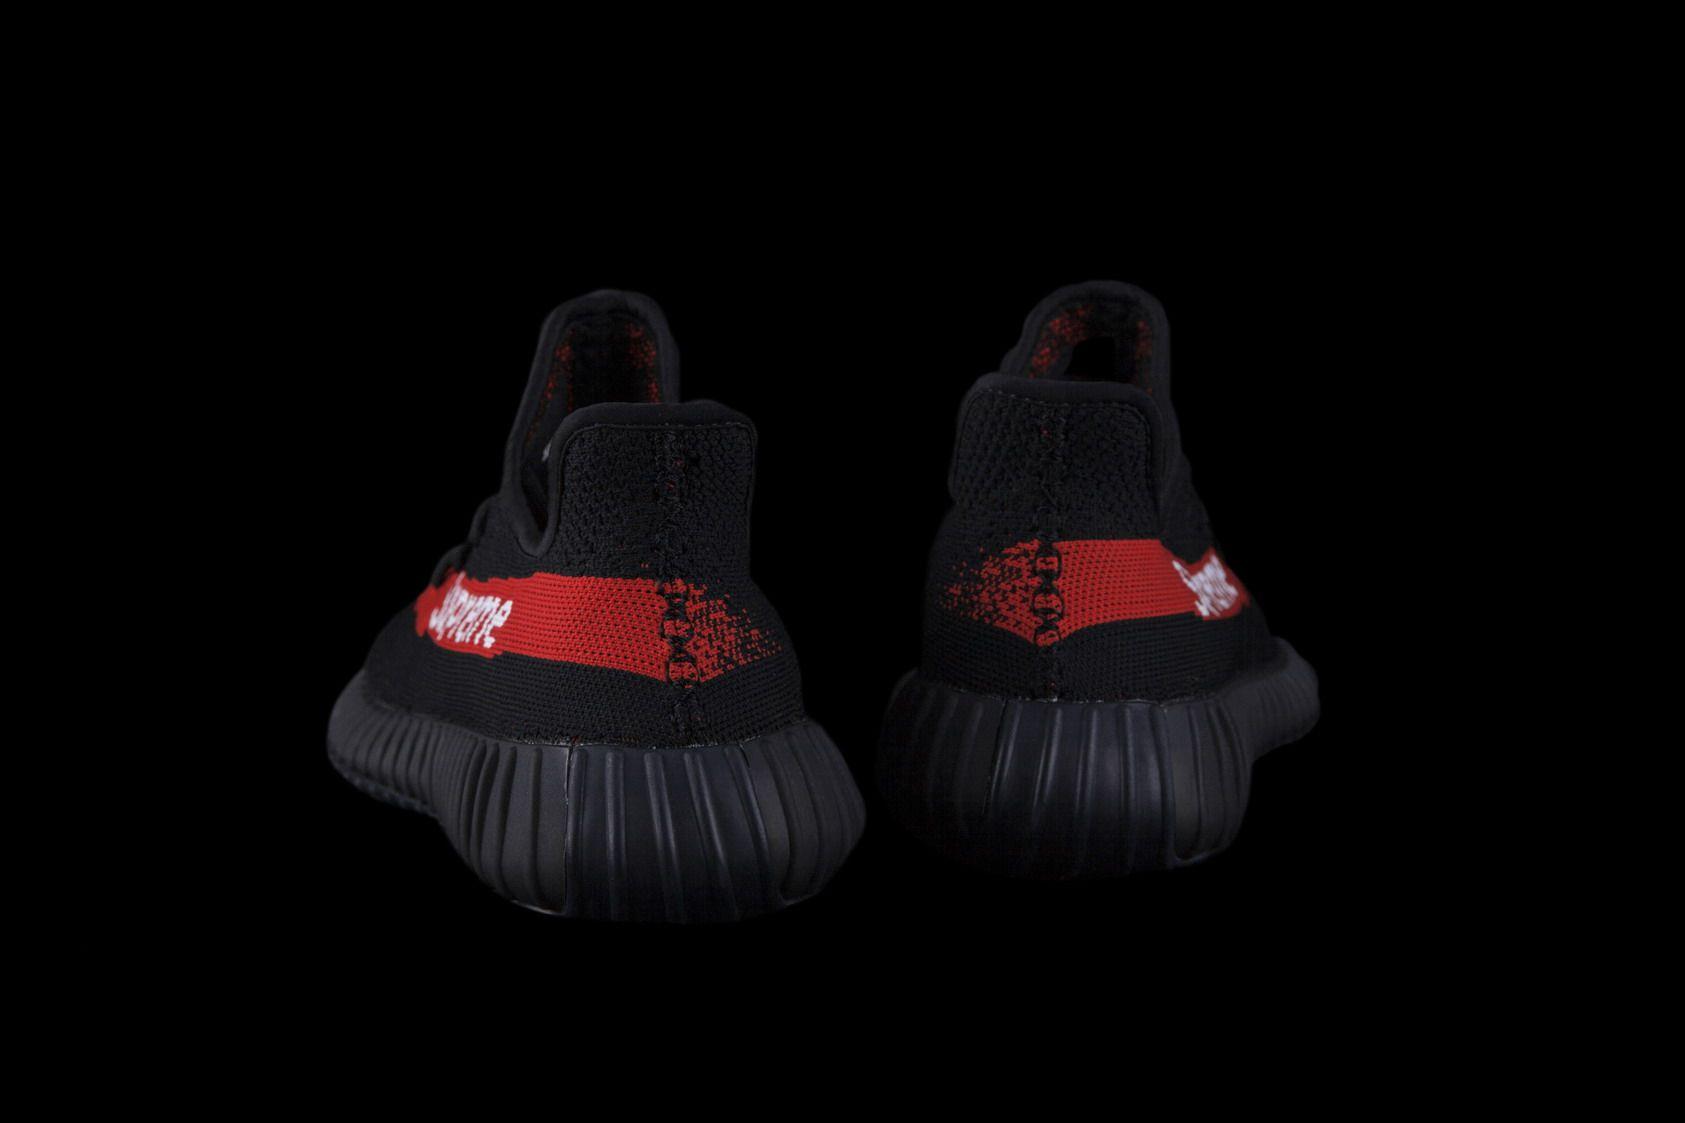 10b351c6b50e8 Adidas Yeezy Boost 350 V2 Black Supreme Real Boost 18